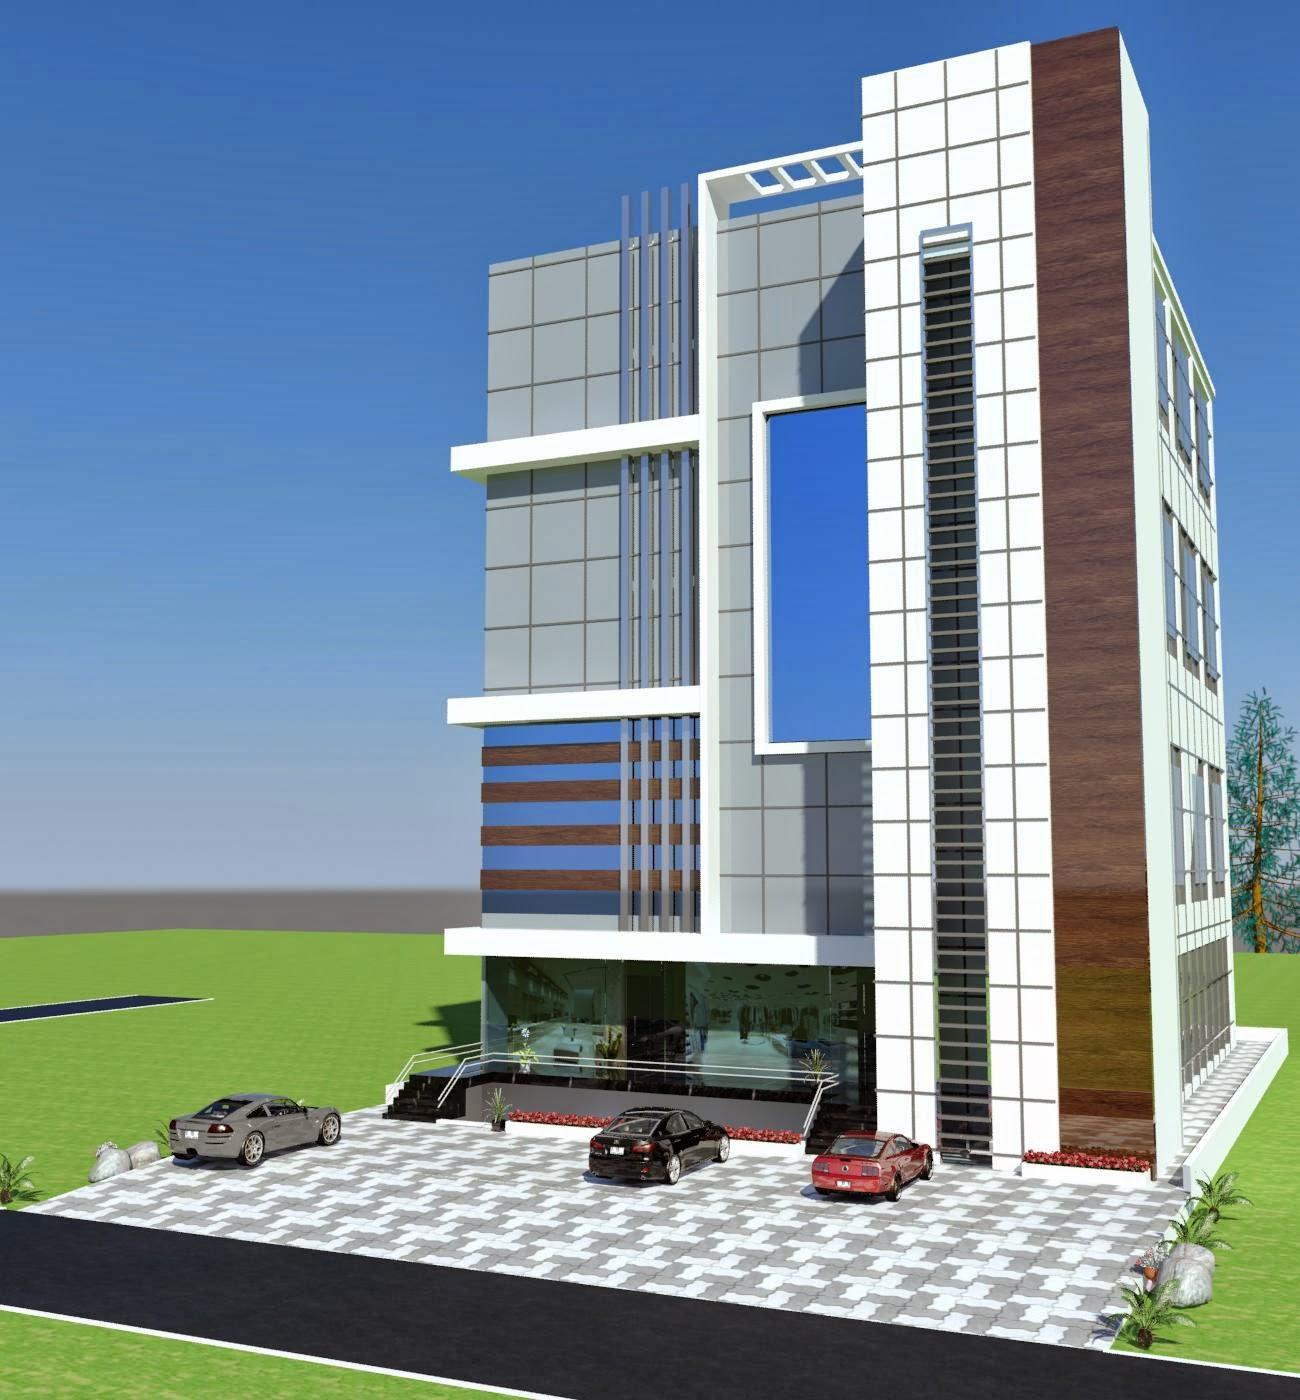 3d Building Elevation 3d Front Elevation: 3D Front Elevation.com: Commercial Plaza Plan 3d Front